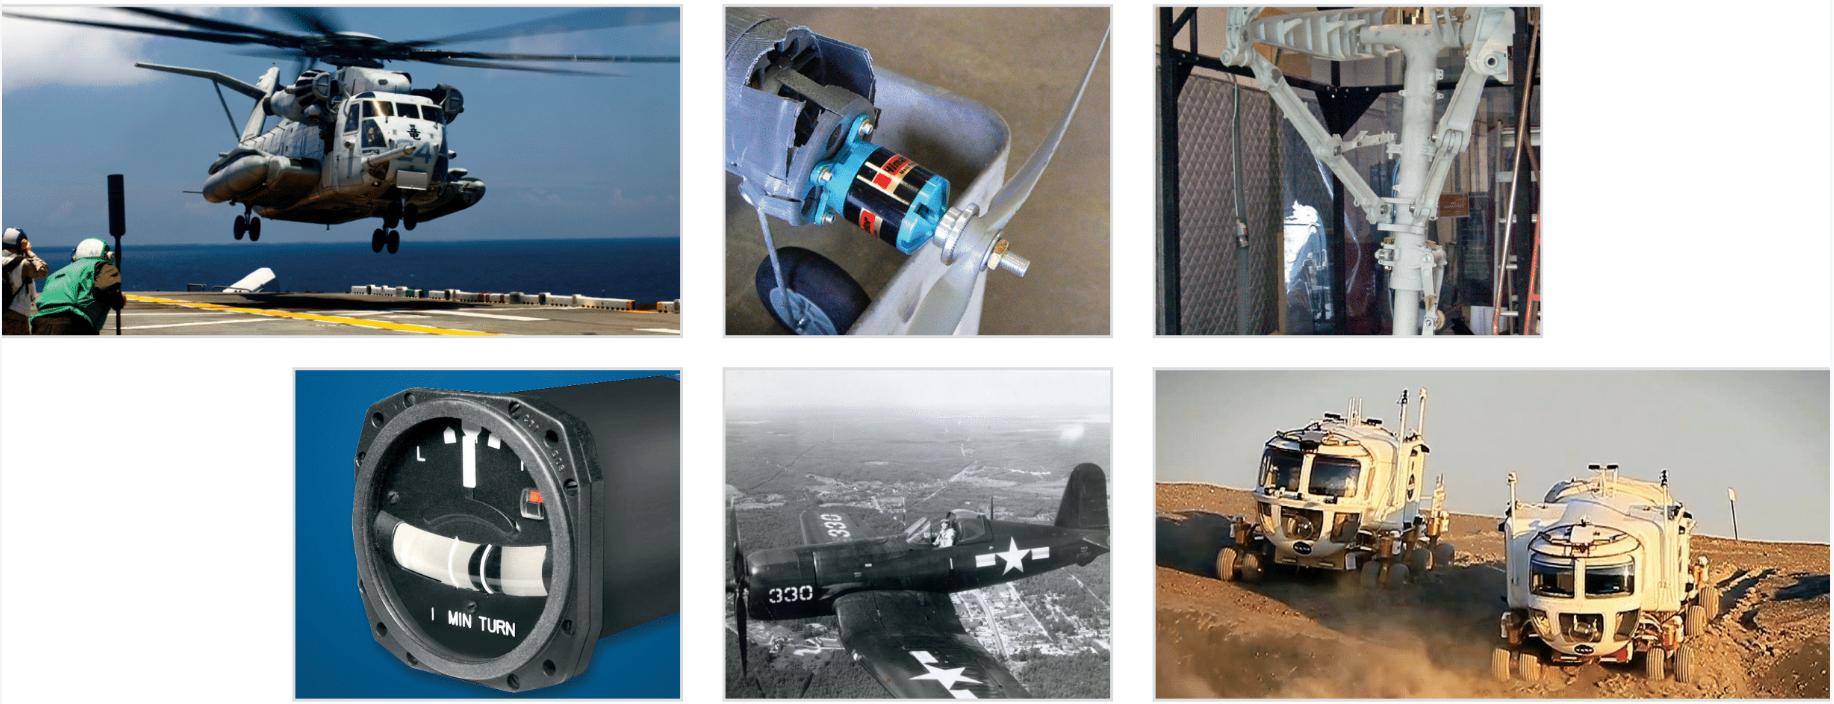 Aerospace & Automotive Industries